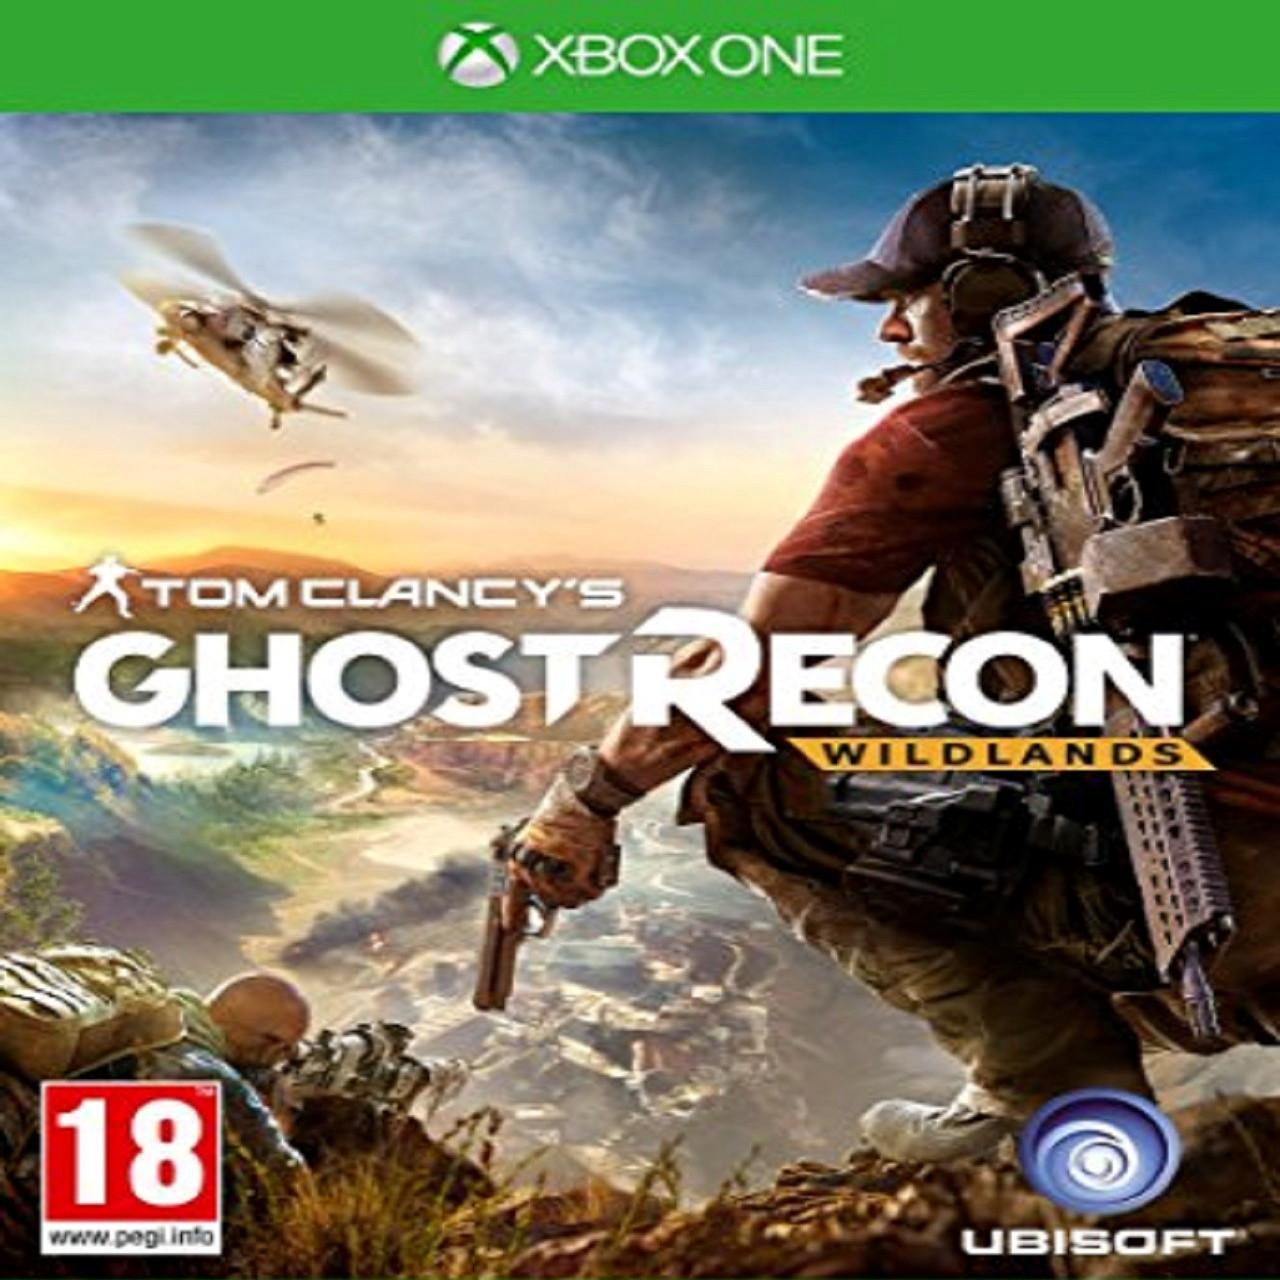 Tom Clancys Ghost Recon Wildlands (російська версія) Xbox One